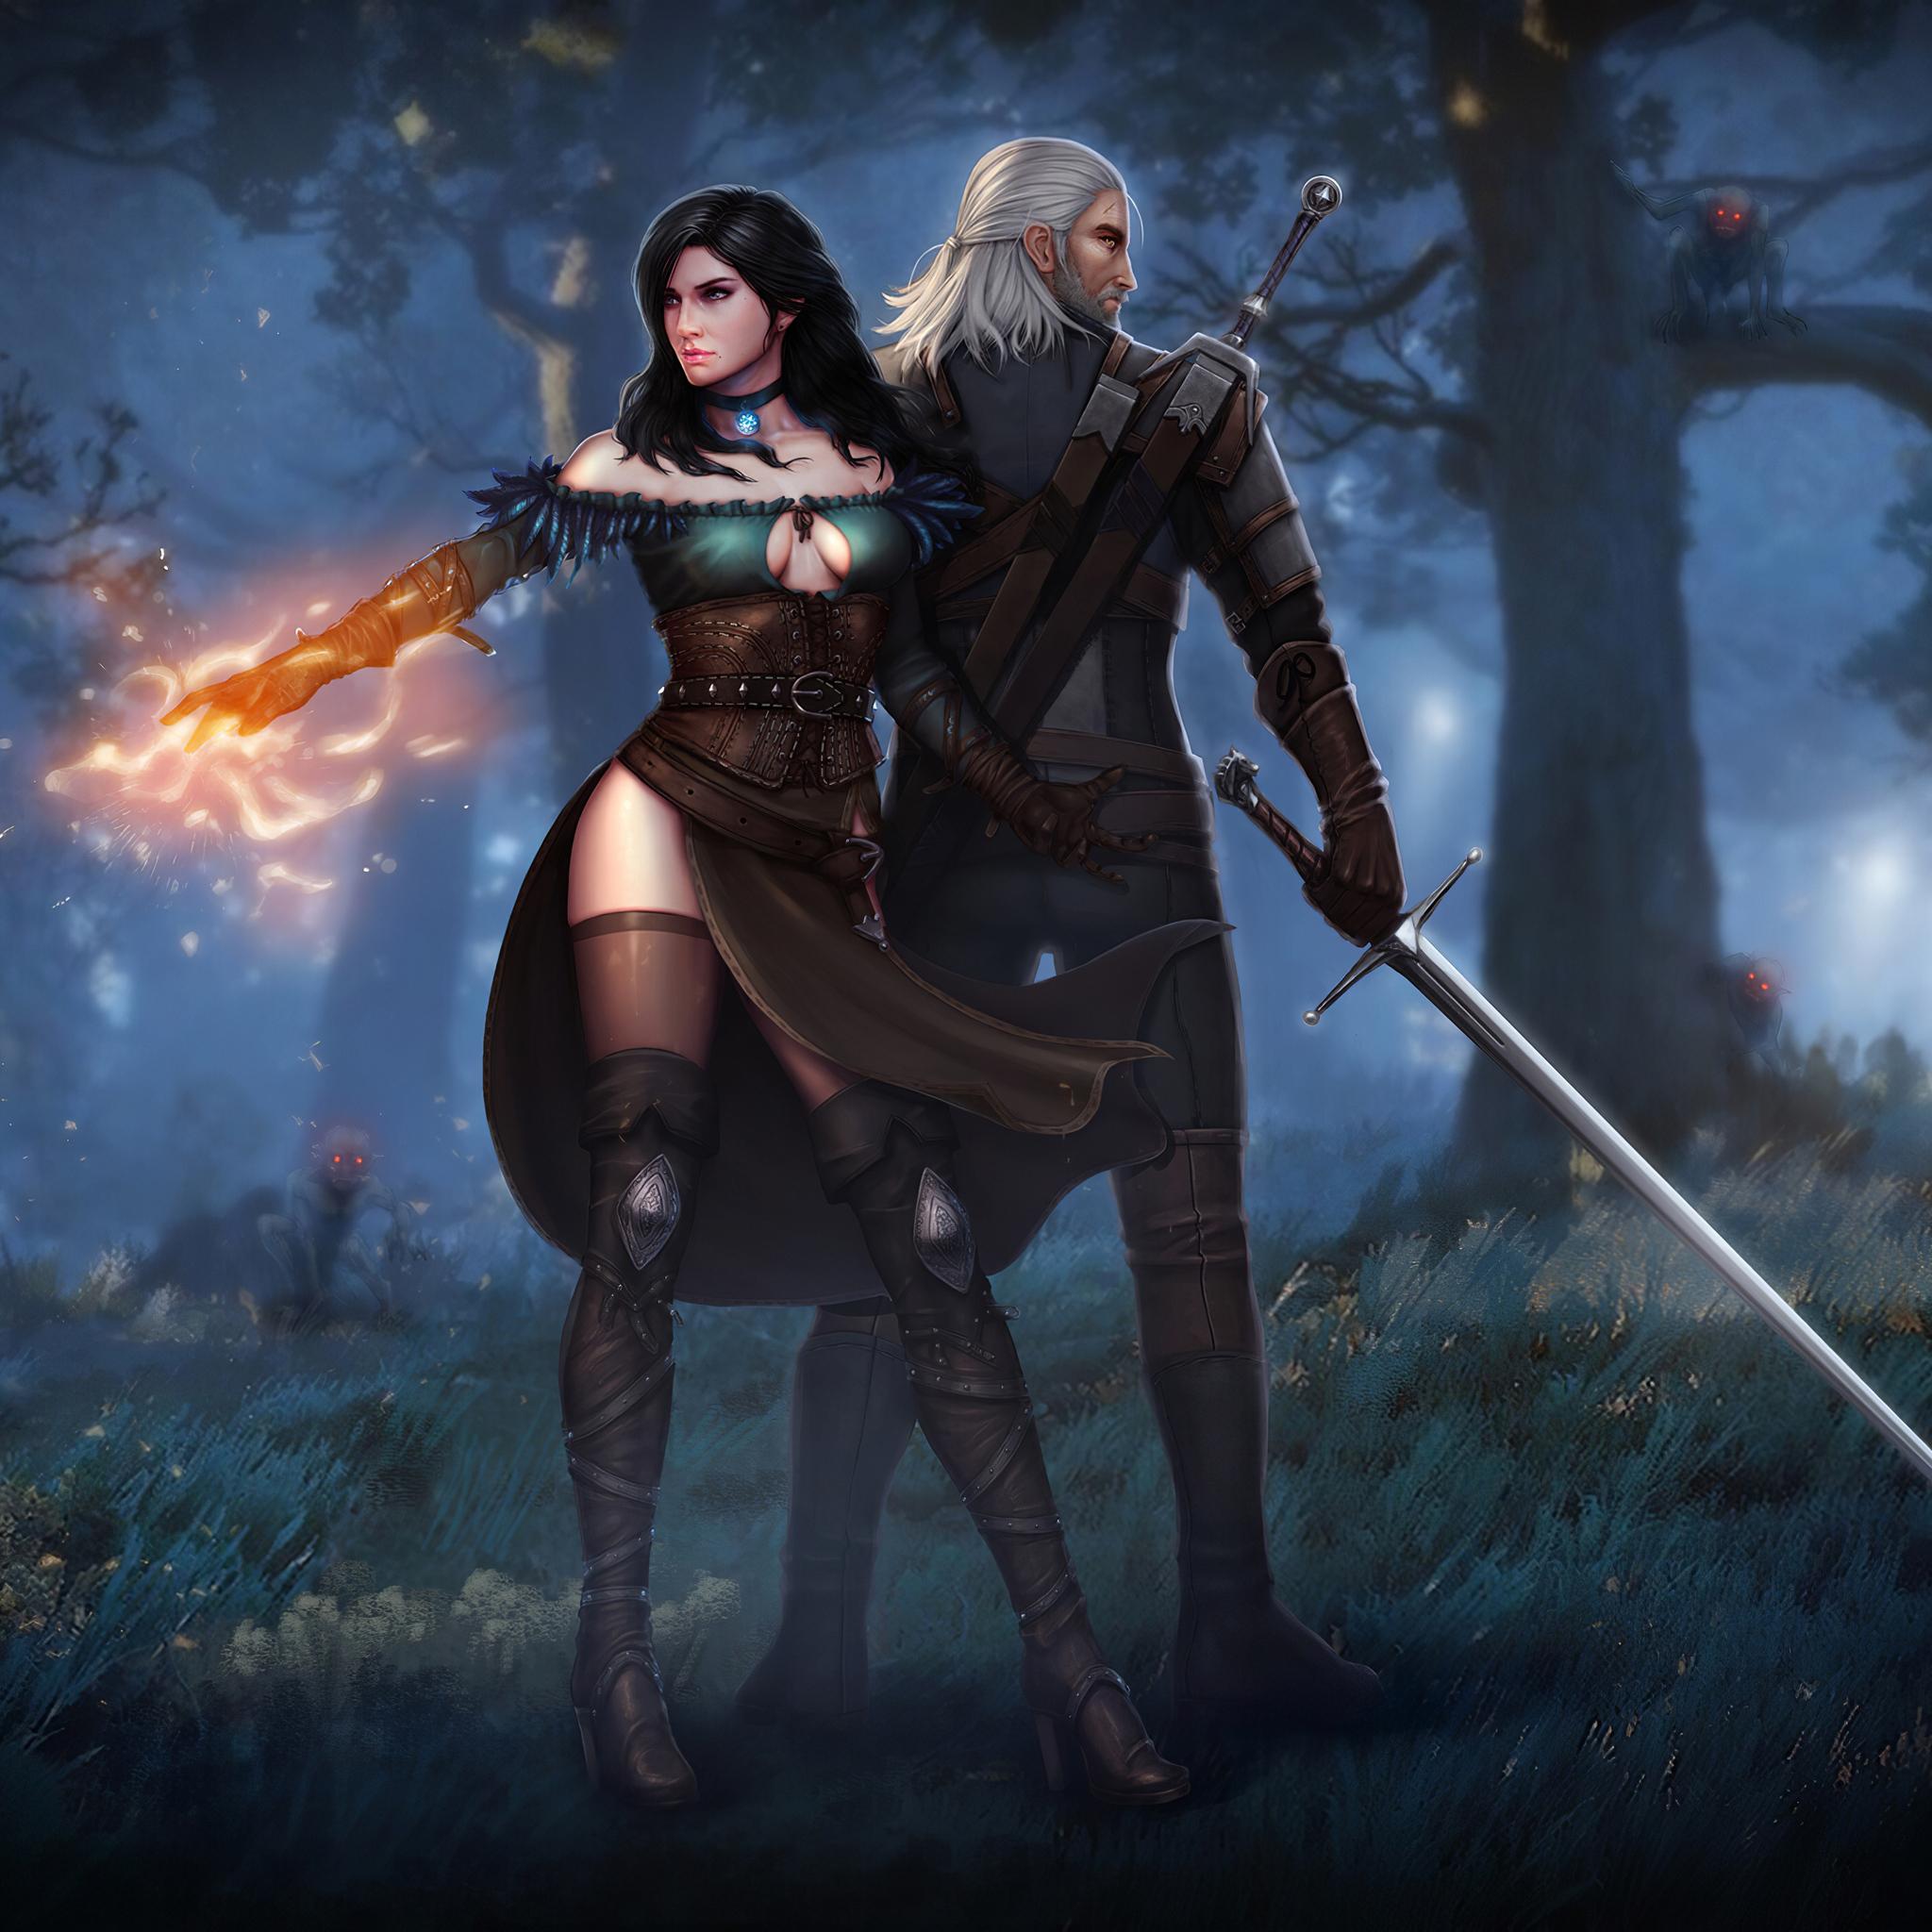 2048x2048 Witcher 3 Wild Hunt Geralt Yen And Ciri 4k Ipad Air Hd